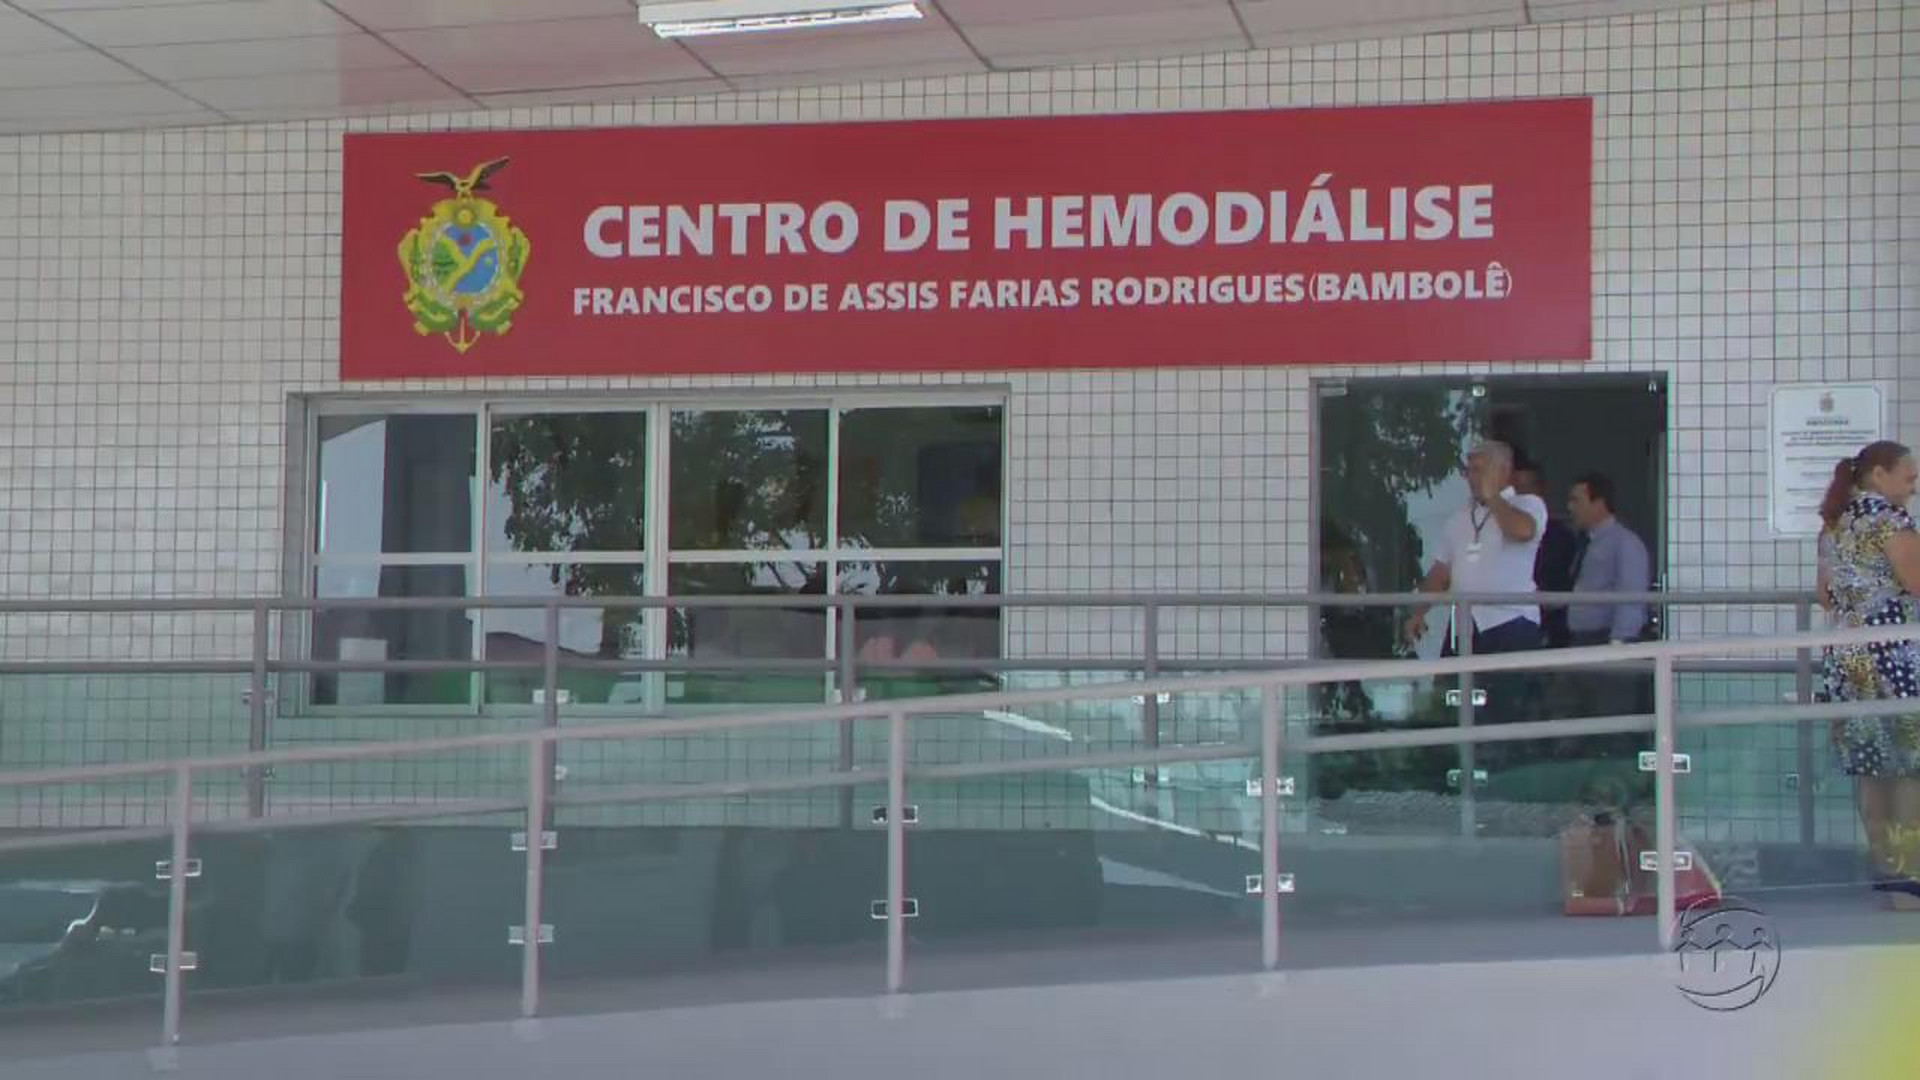 PRIMEIRO CENTRO DE HEMODIÁLISE É INAUGURADO NA CIDADE - A Crítica Na TV - 31/07/17